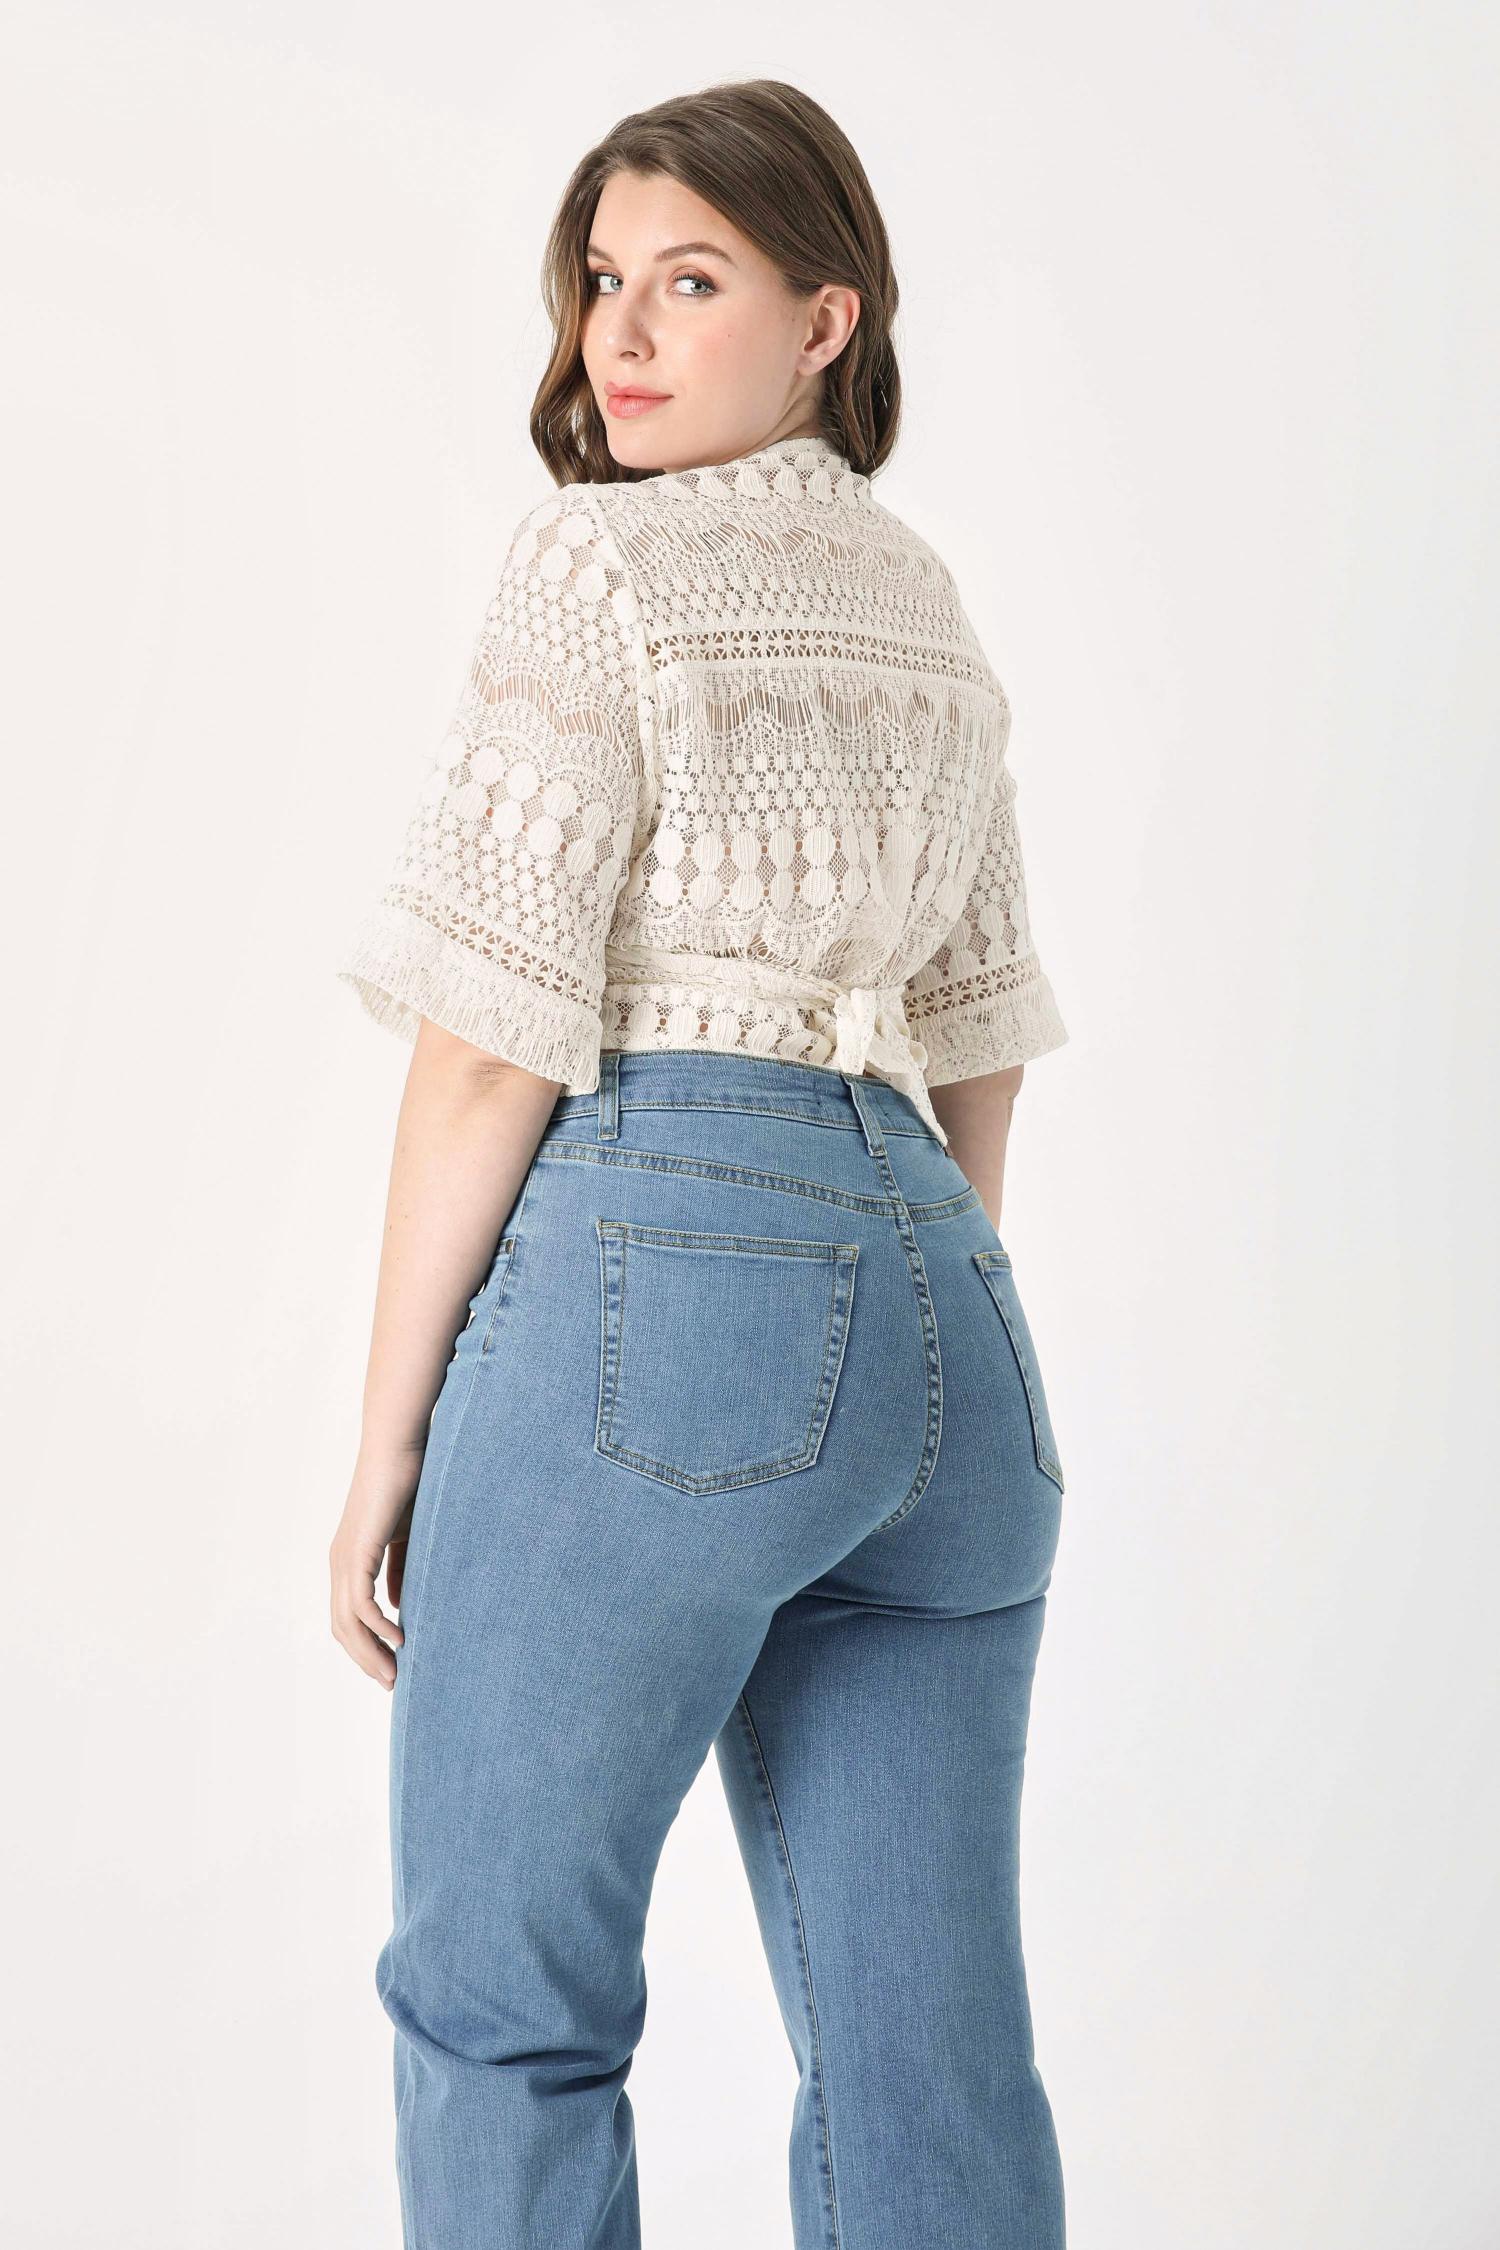 Short lace bolero (shipping April 10/15)